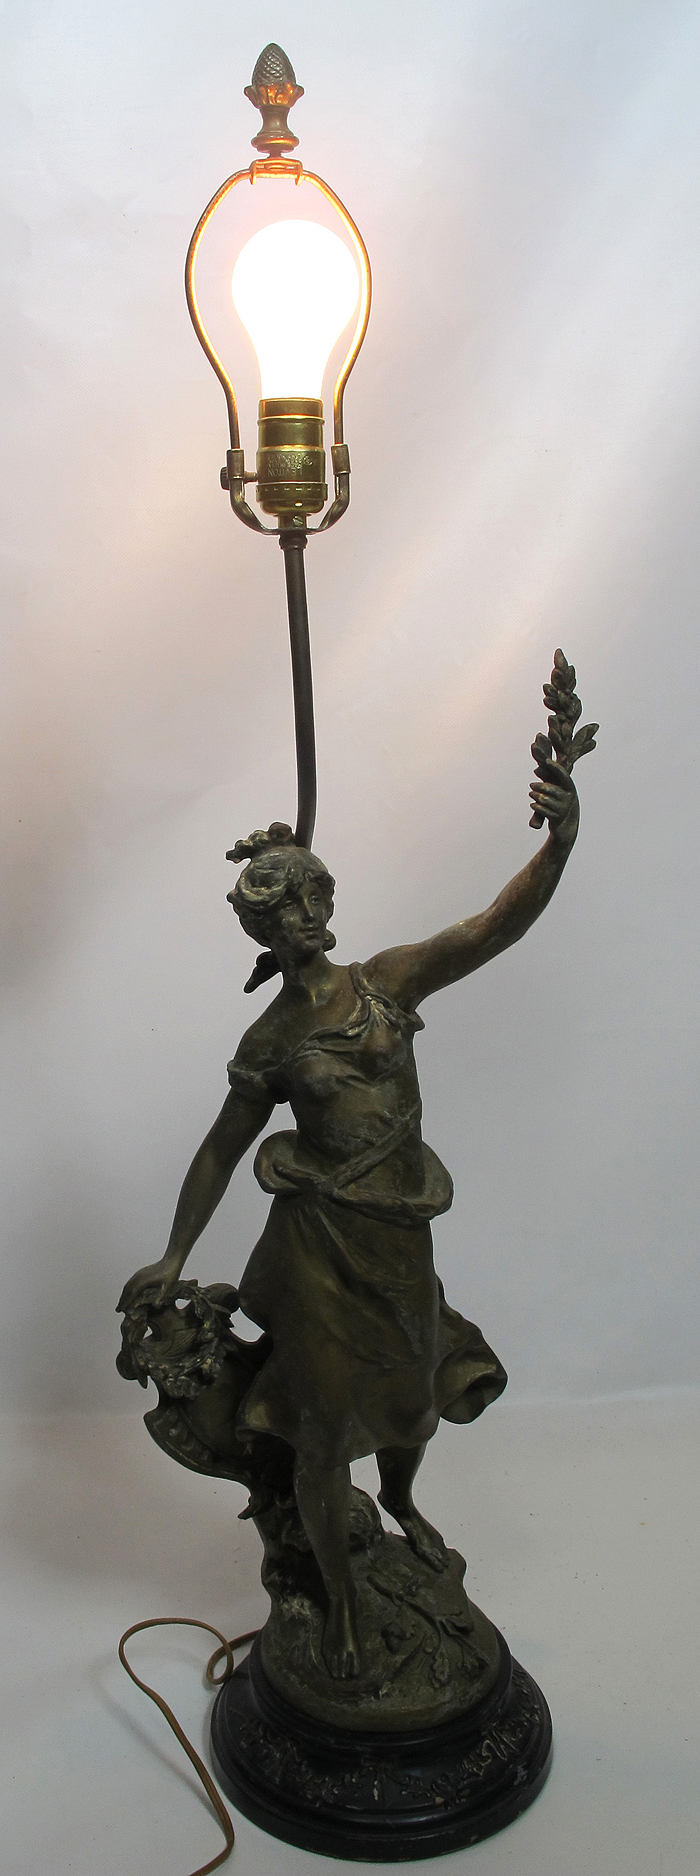 Antique Louis Moreau Signed French Bronze Spelter Figural Lamp Greek Goddess Yqz Ebay